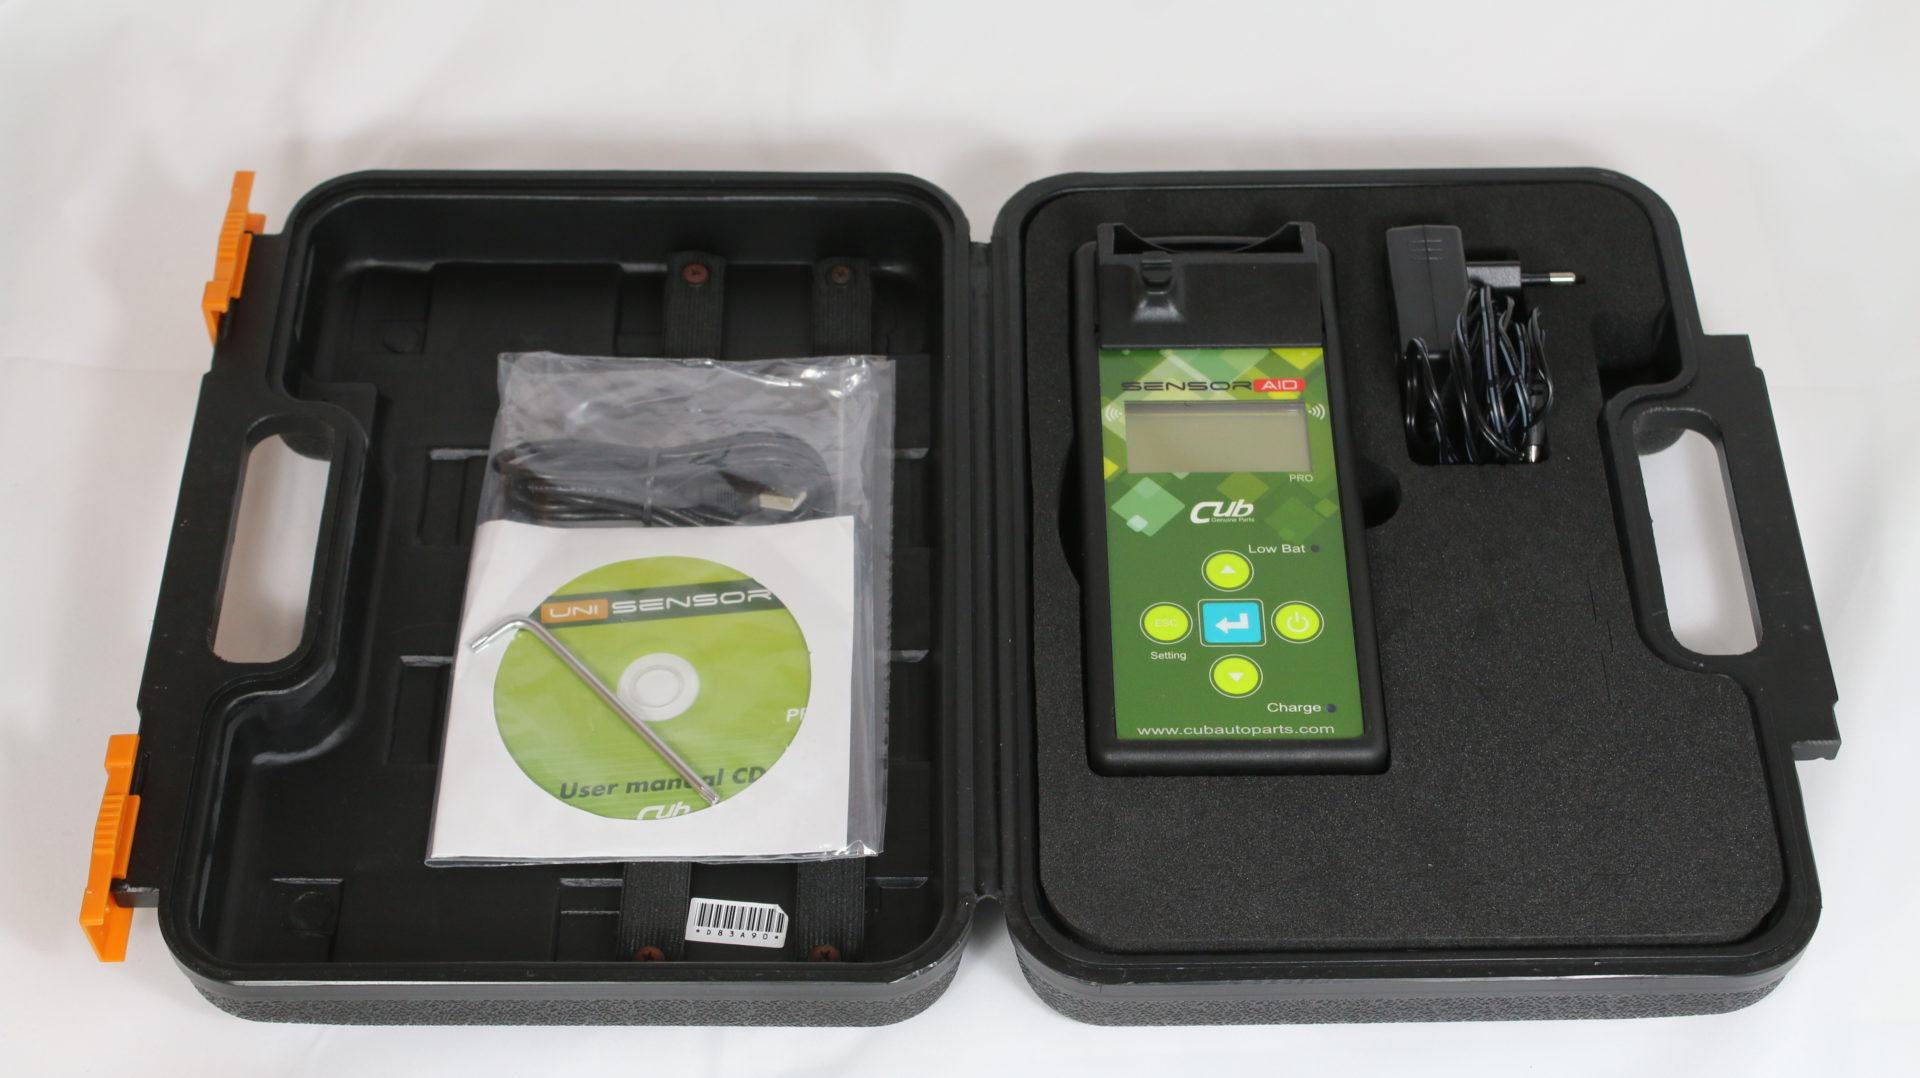 CUB Uni Sensor Sensor Aid RDKS TPMS Tesla Programmiergerät 433 MHz 315 MHz Diagnosegerät Reifendruckkontrollsystem Greenspeed Lieferumfang kaufen